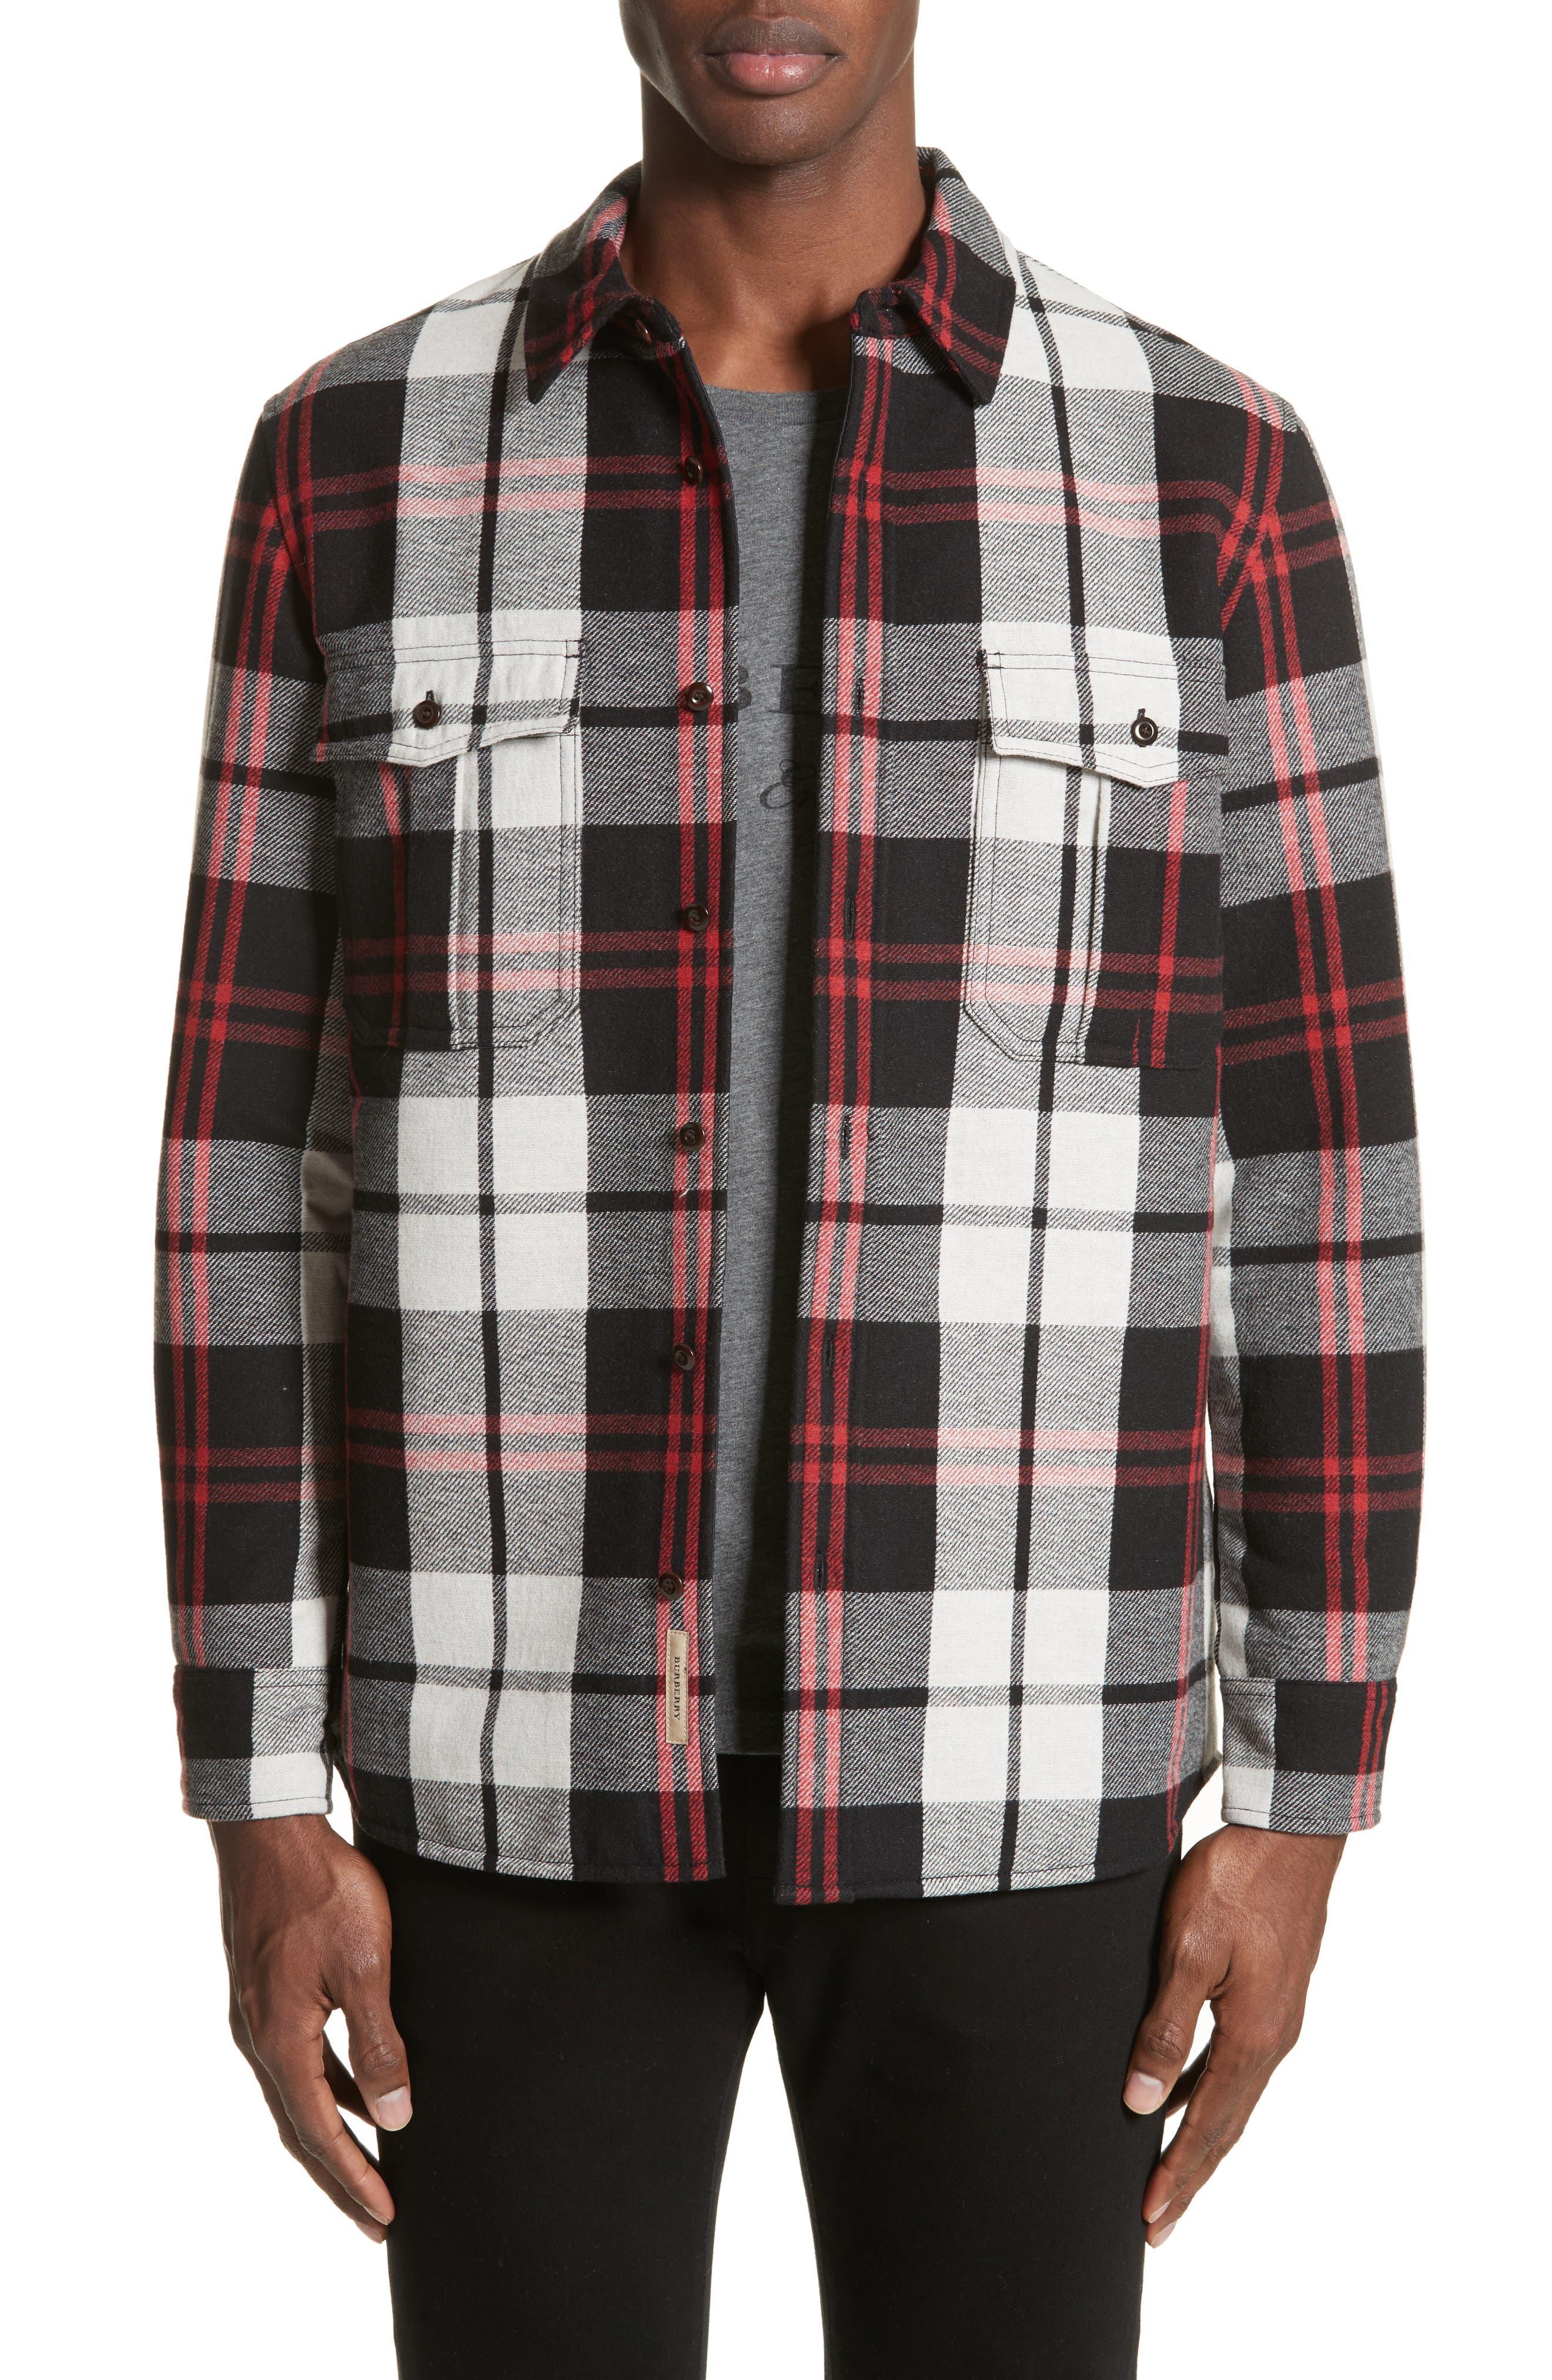 Polesworth Plaid Flannel Shirt,                         Main,                         color, Black